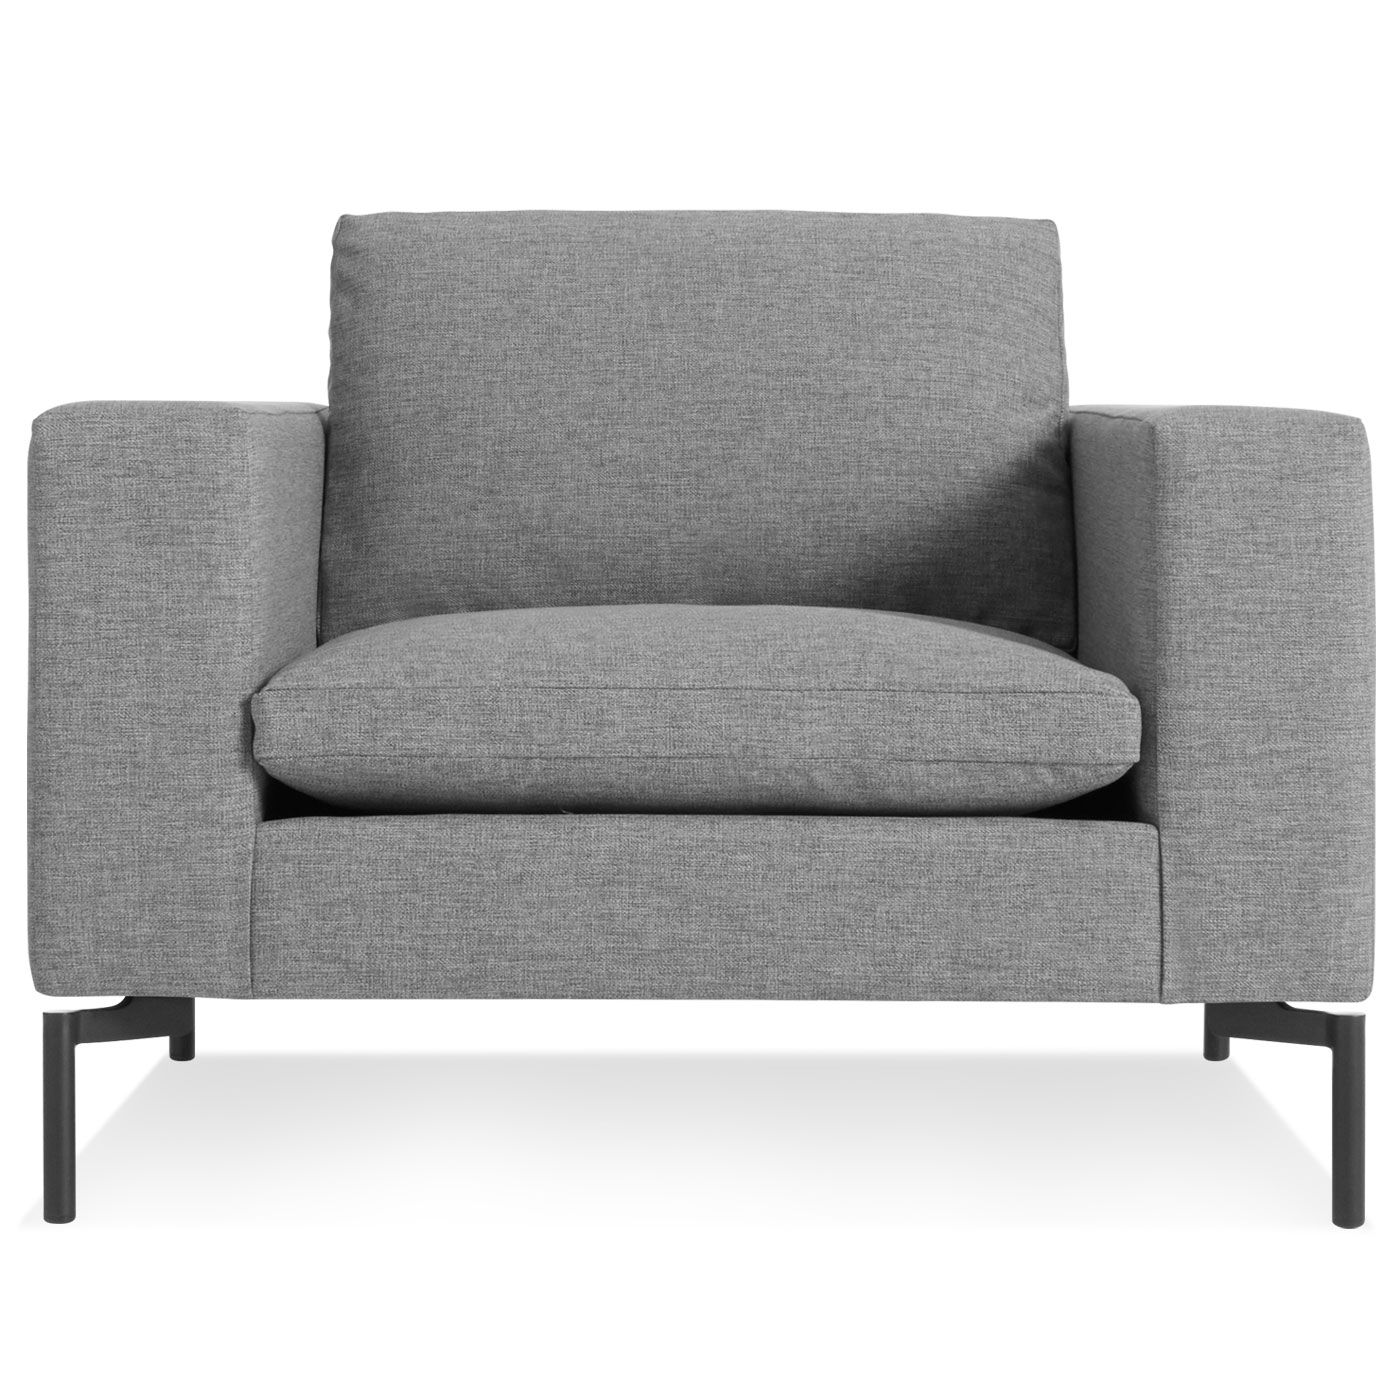 Best The New Standard Lounge Chair Spitzer Grey Black 400 x 300